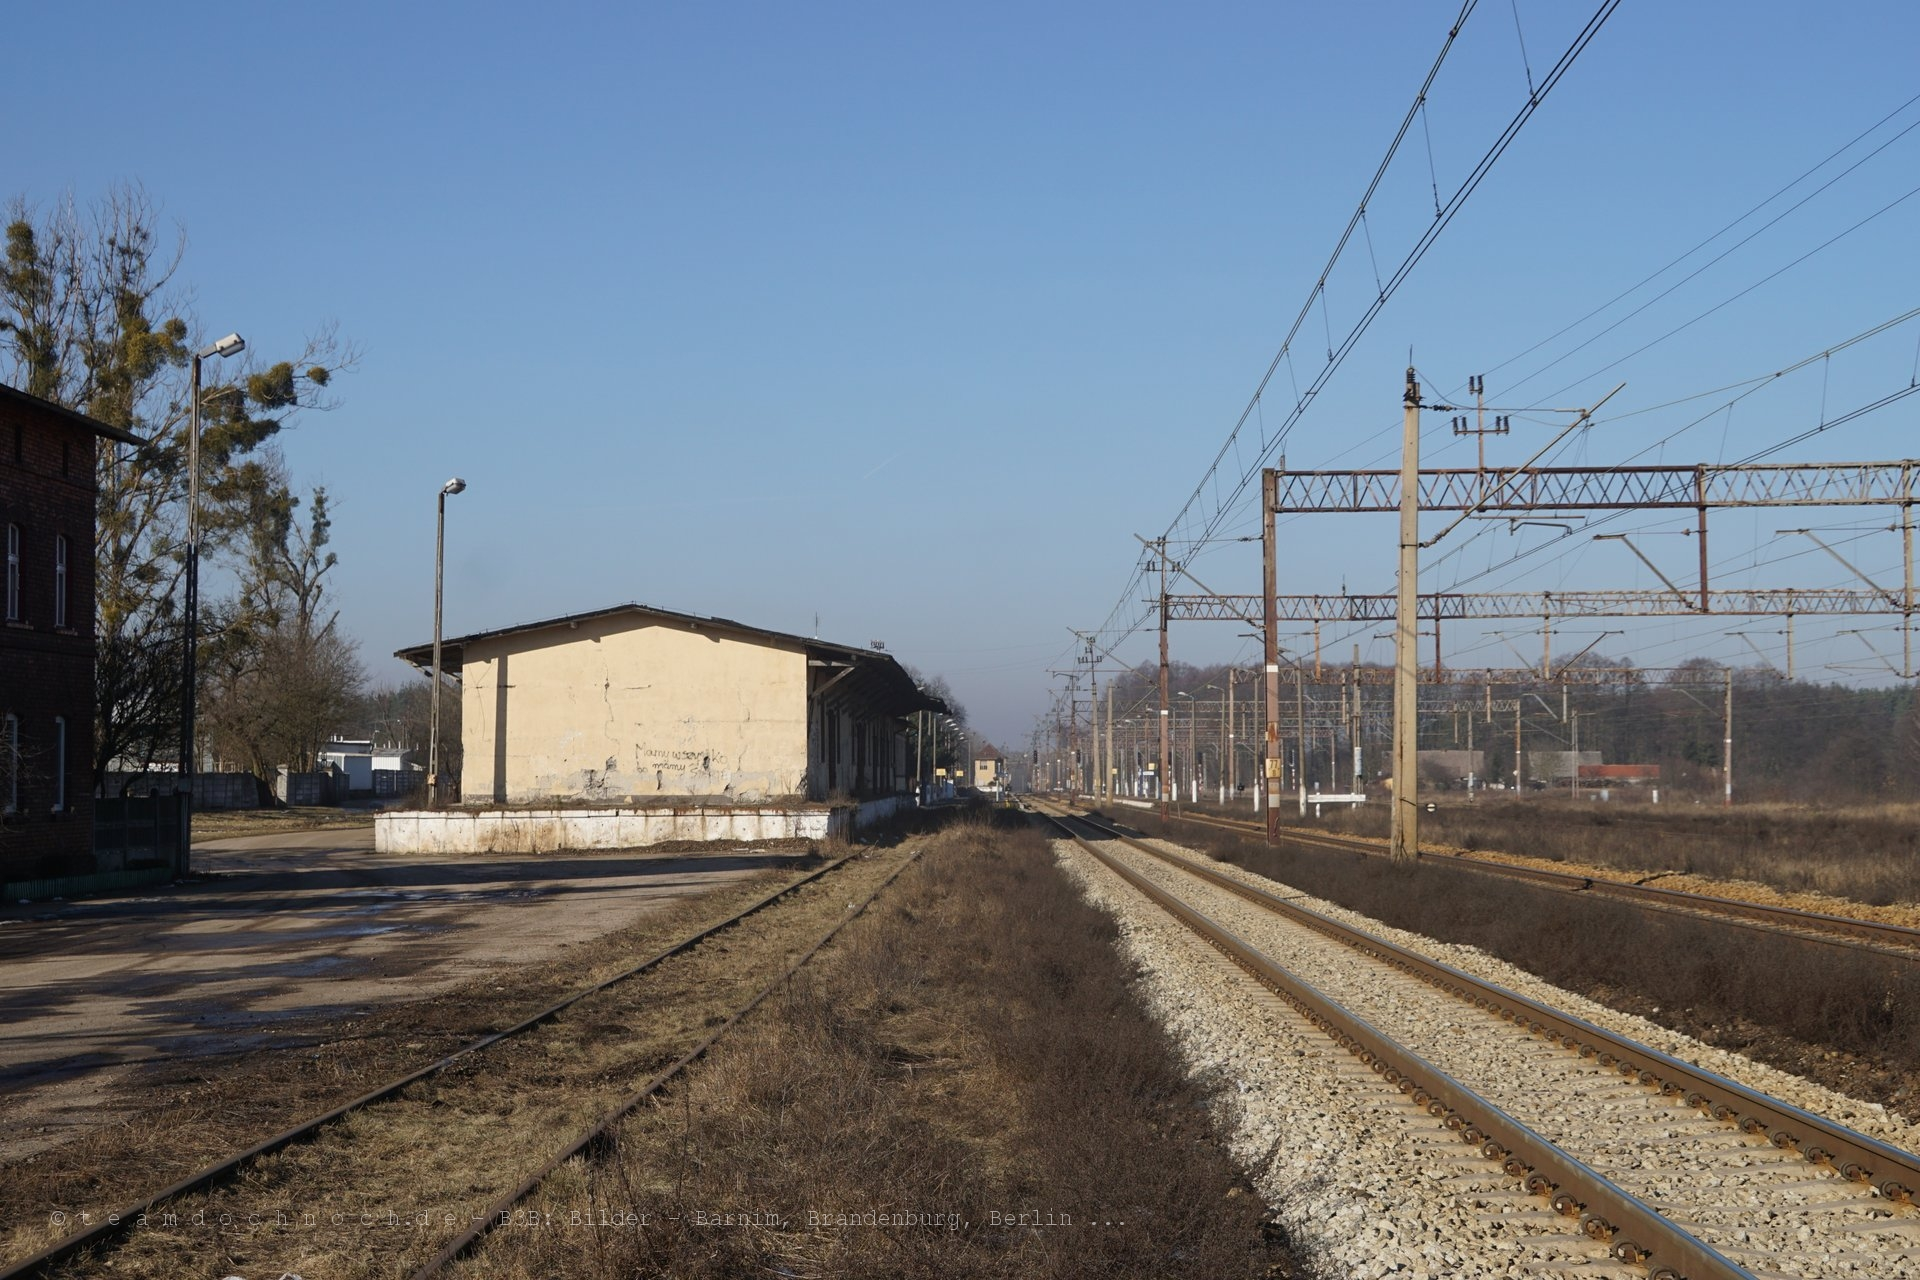 Bahnhof Drawski Młyn